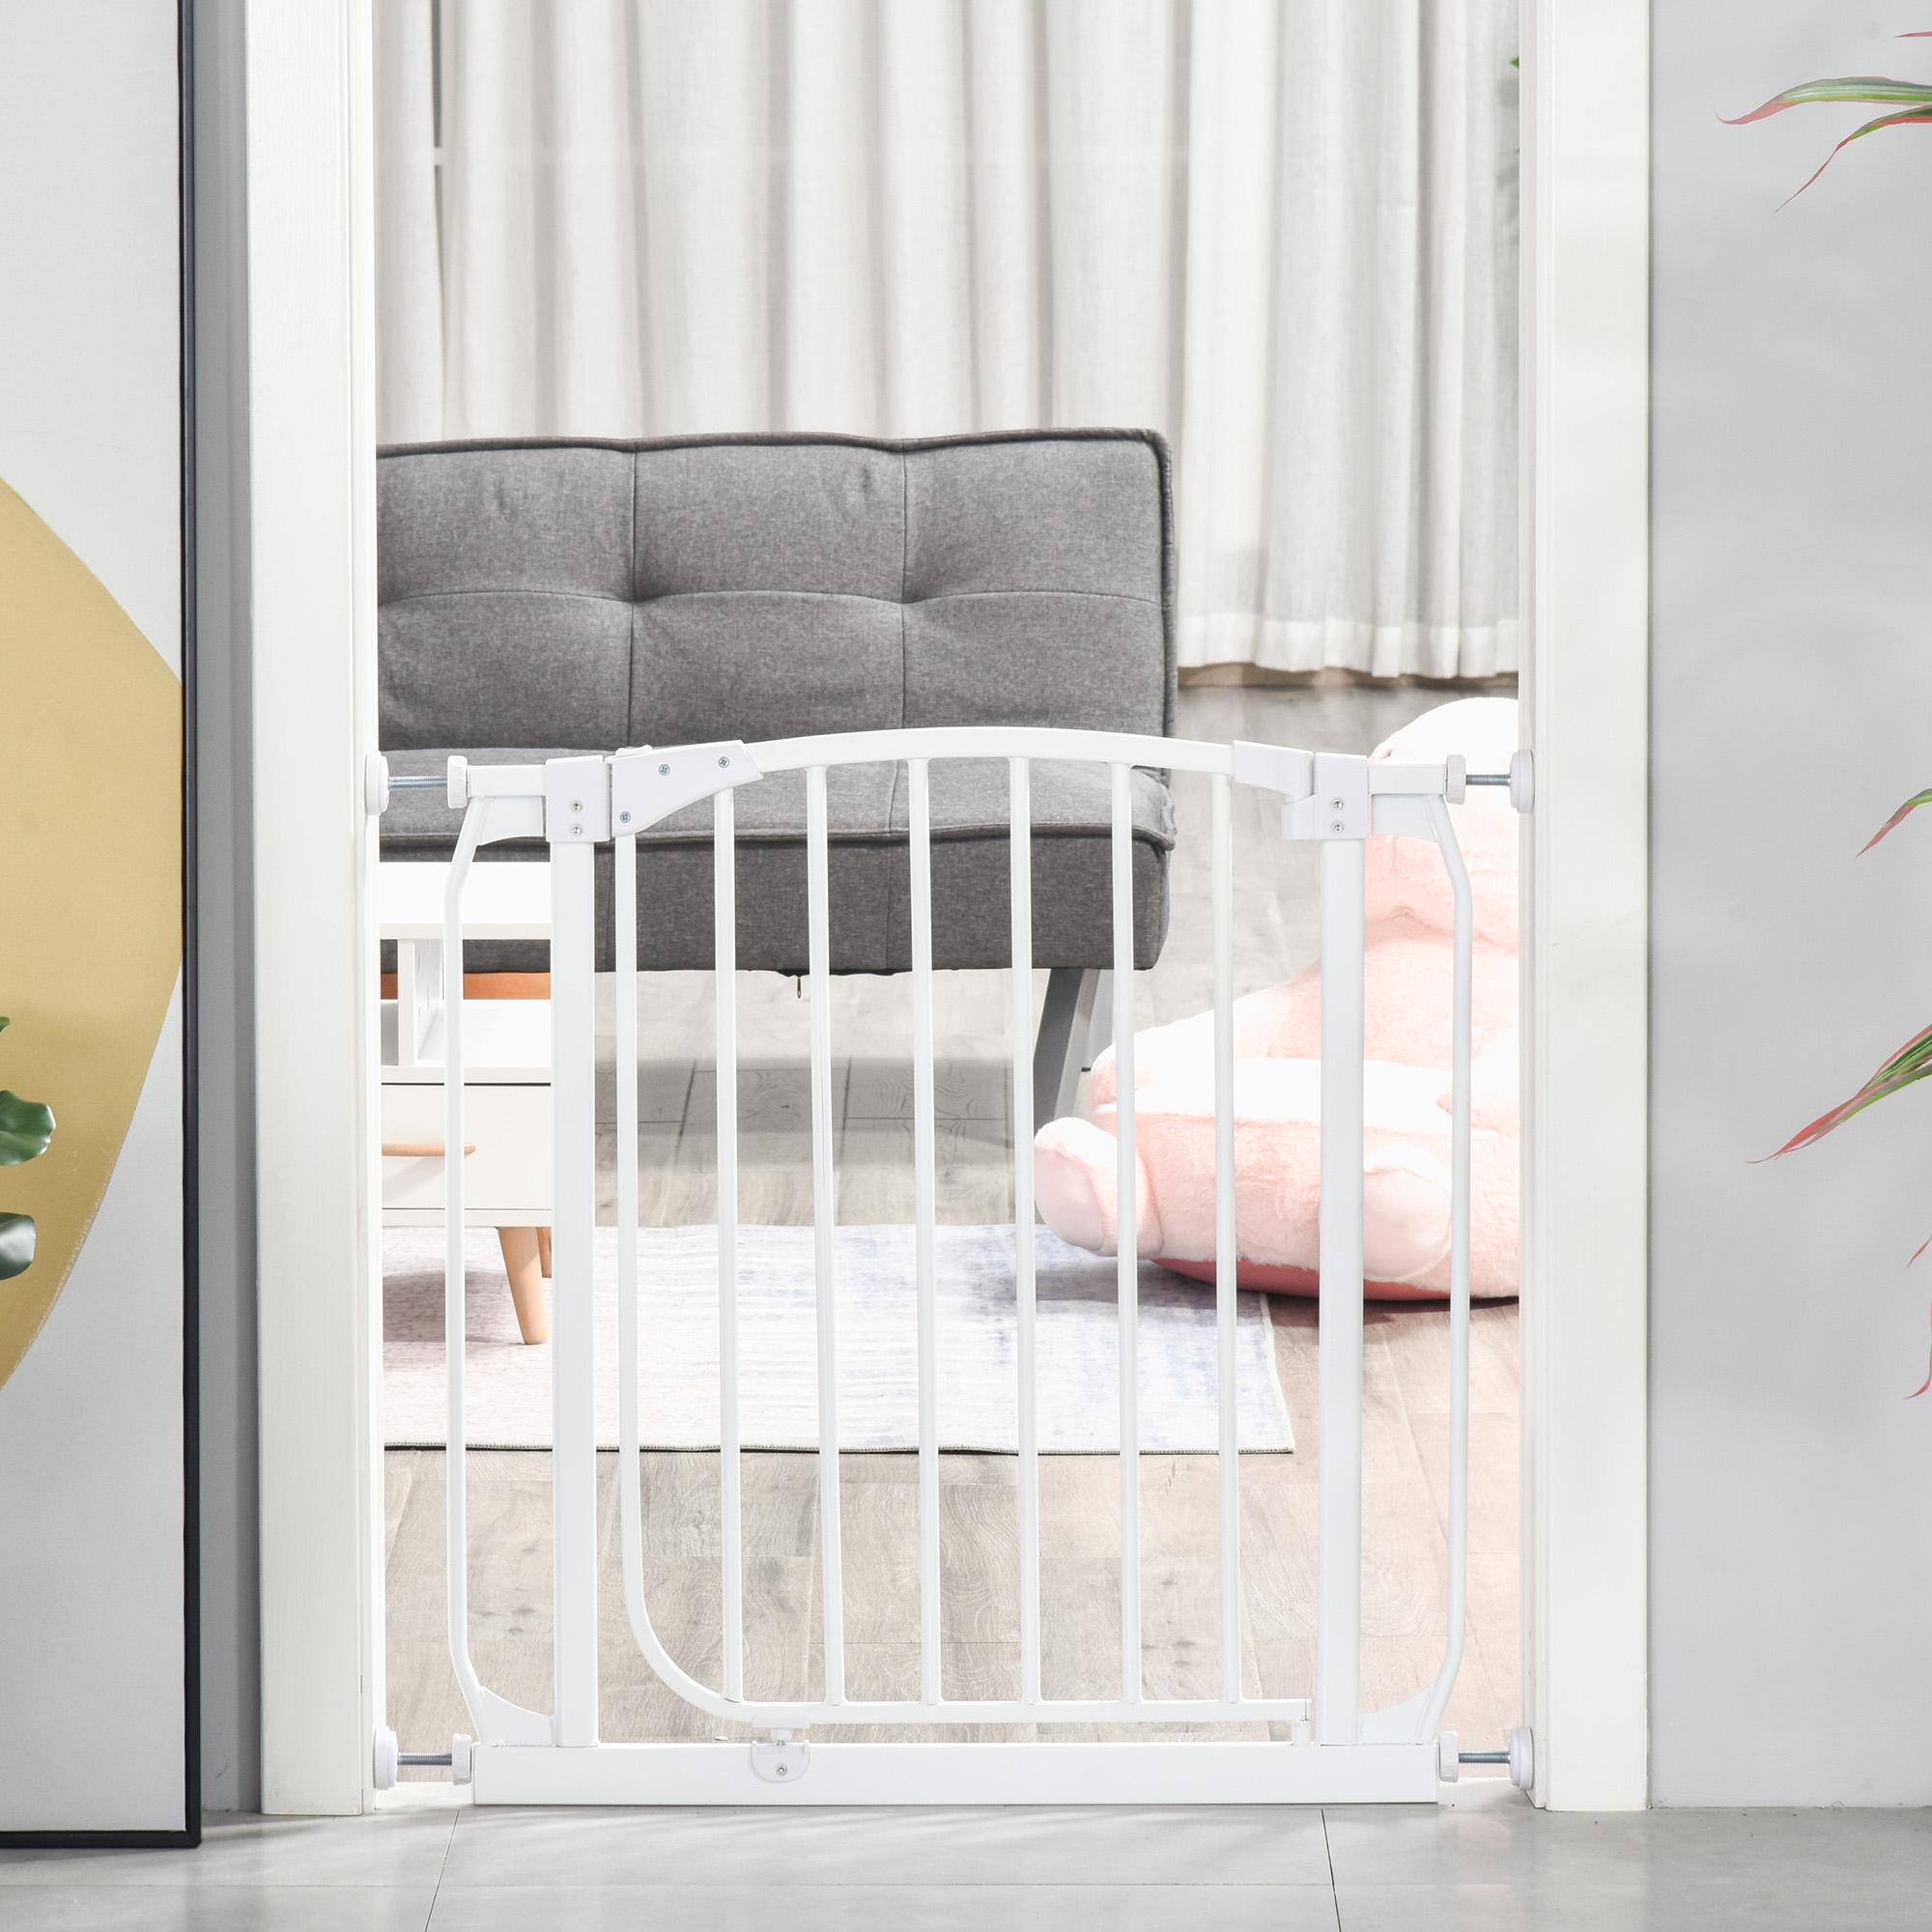 HOMCOM Baby Safety Gate Stair Kid Pressure Fit Divider Home with Adjusting Screws White